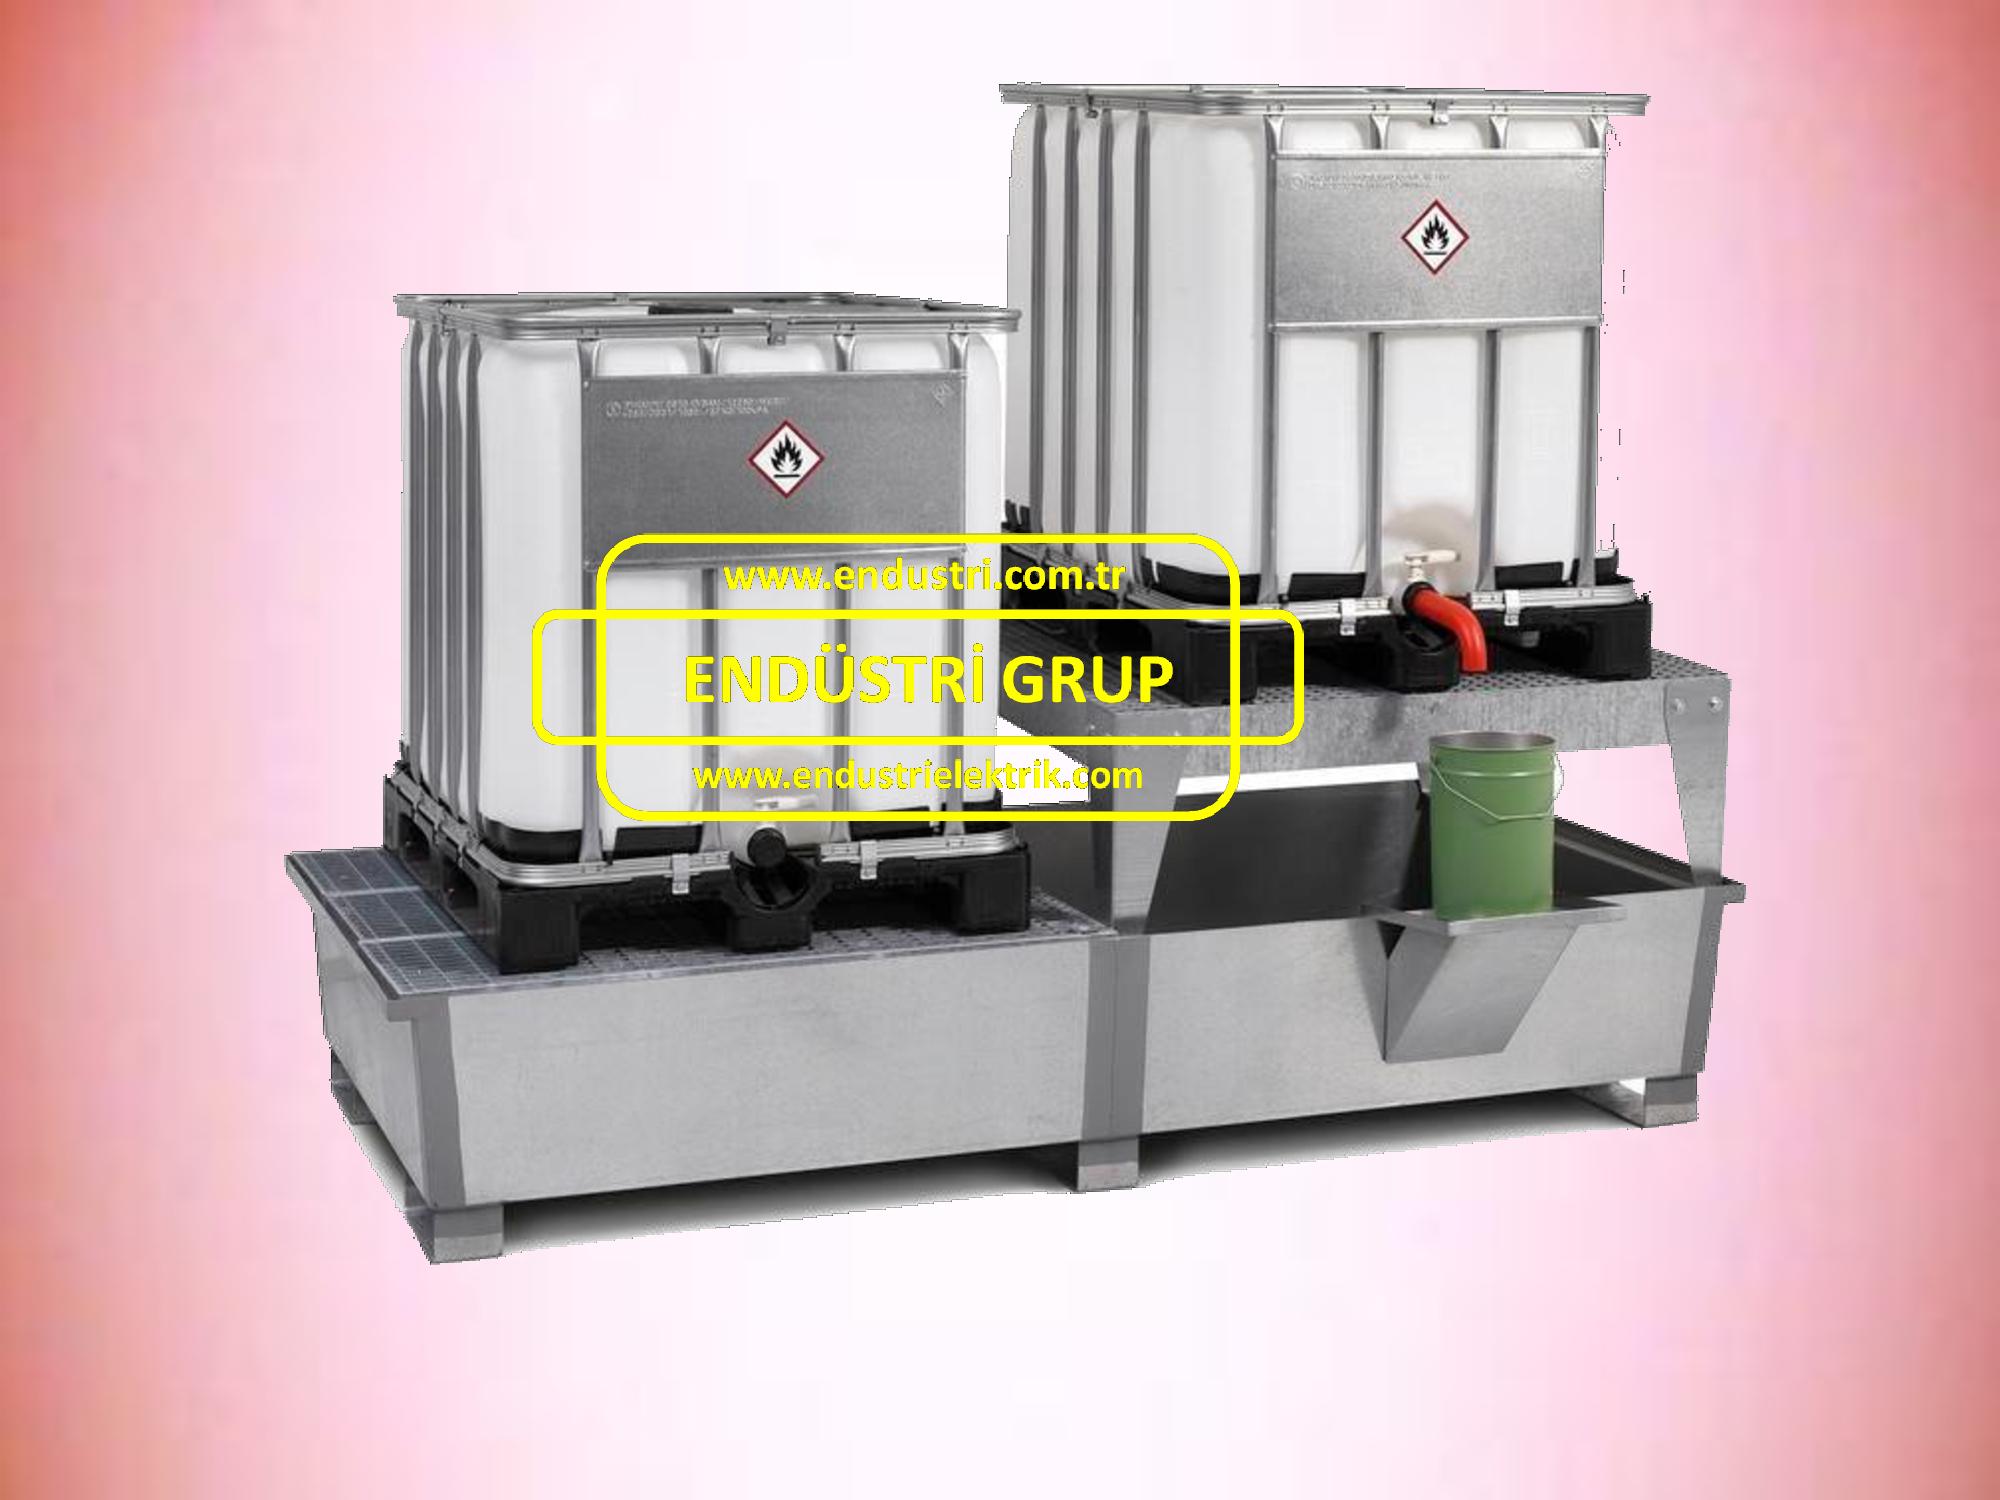 dokulme-sizinti-acil-mudahale-kaplari-tank-konteyner-icin-celik-toplama-kuveti-varil-stoklama-icin-kuvetli-rafkimyasal-madde-dolaplari